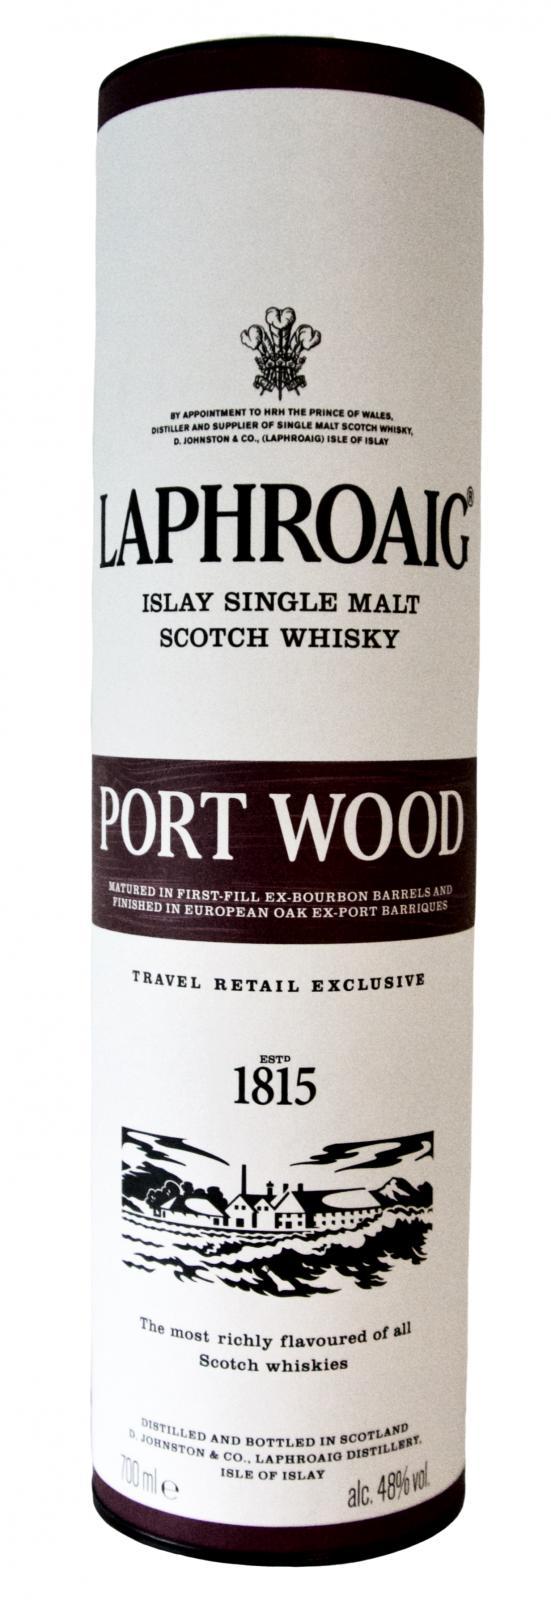 Laphroaig Port Wood